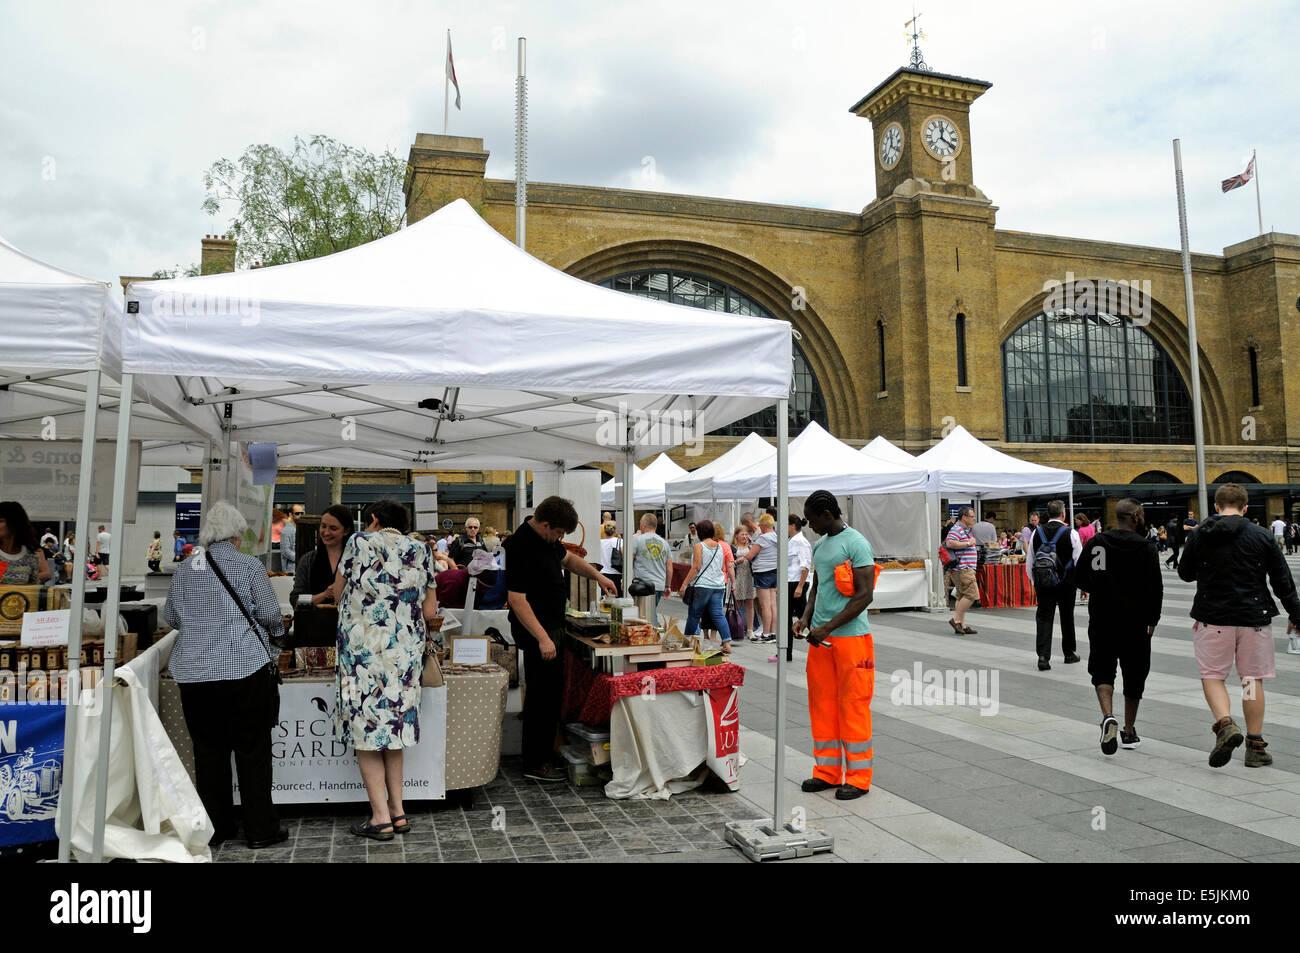 Kings Cross Real Food Market, Kings Cross Station Square, London England Britain UK - Stock Image